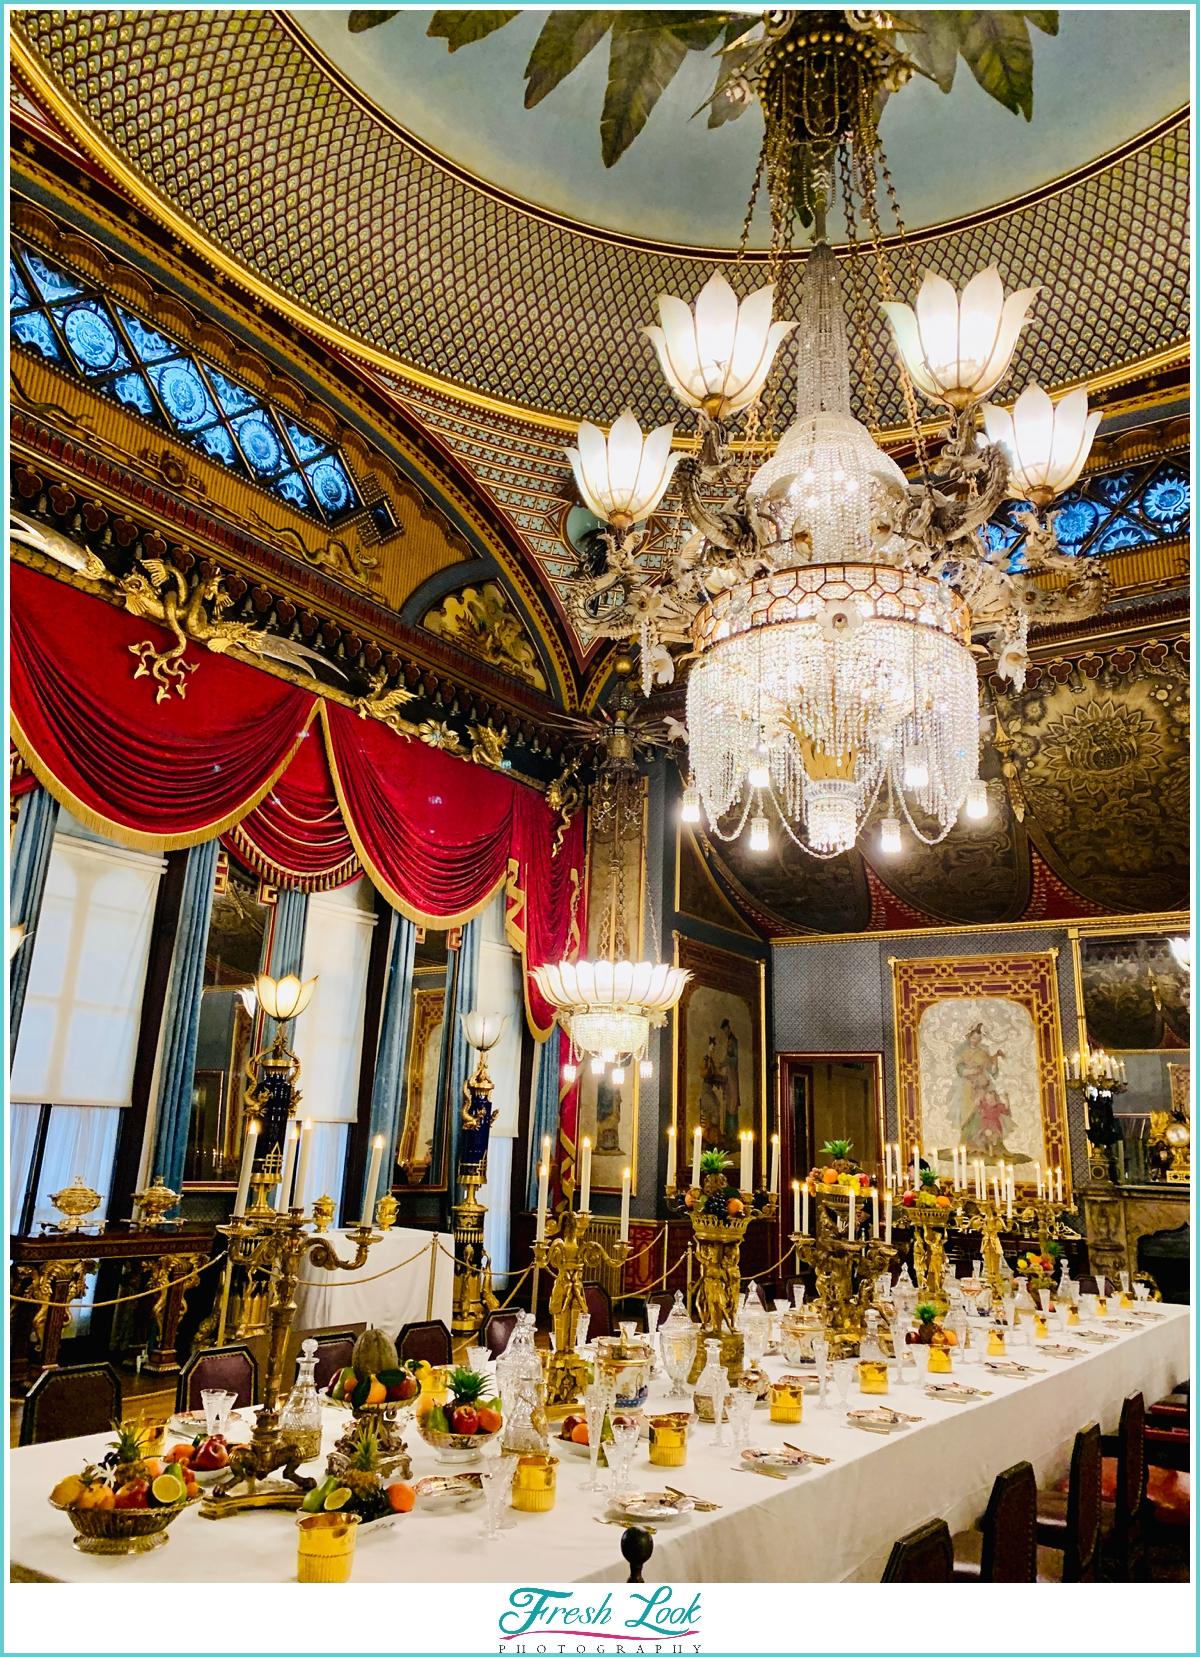 Royal Pavilion Dining Room